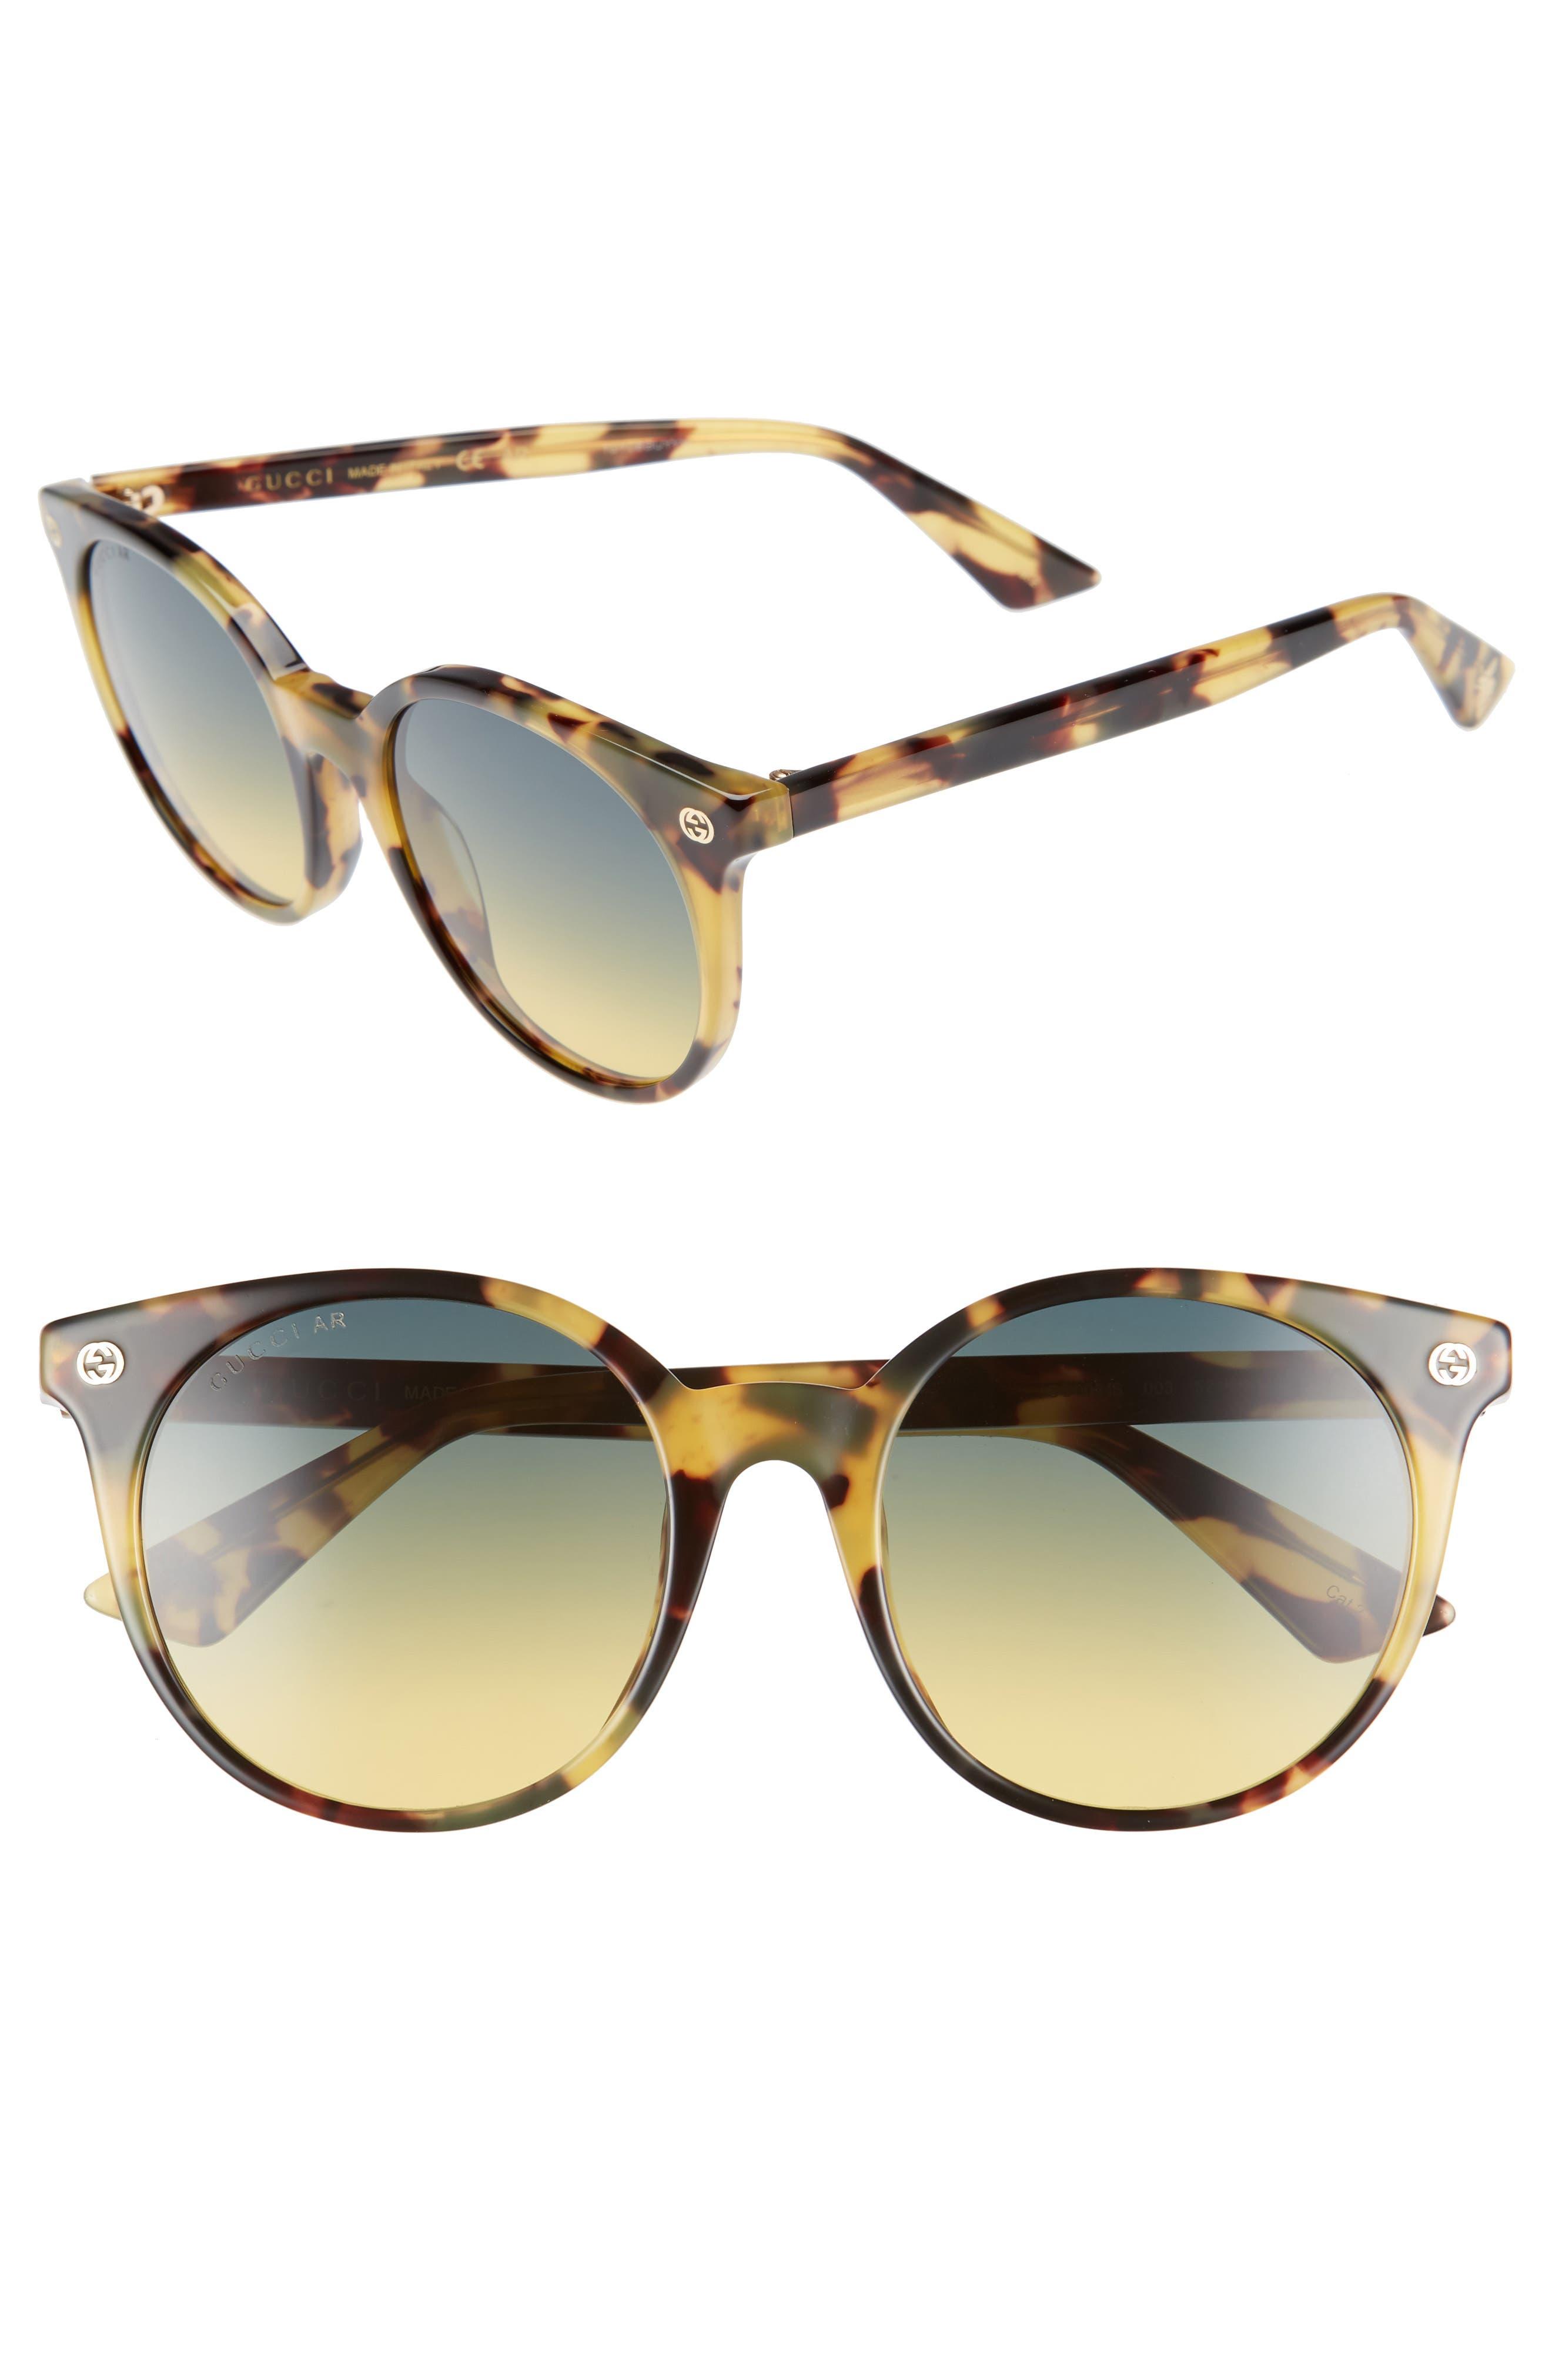 52mm Round Sunglasses,                             Main thumbnail 4, color,